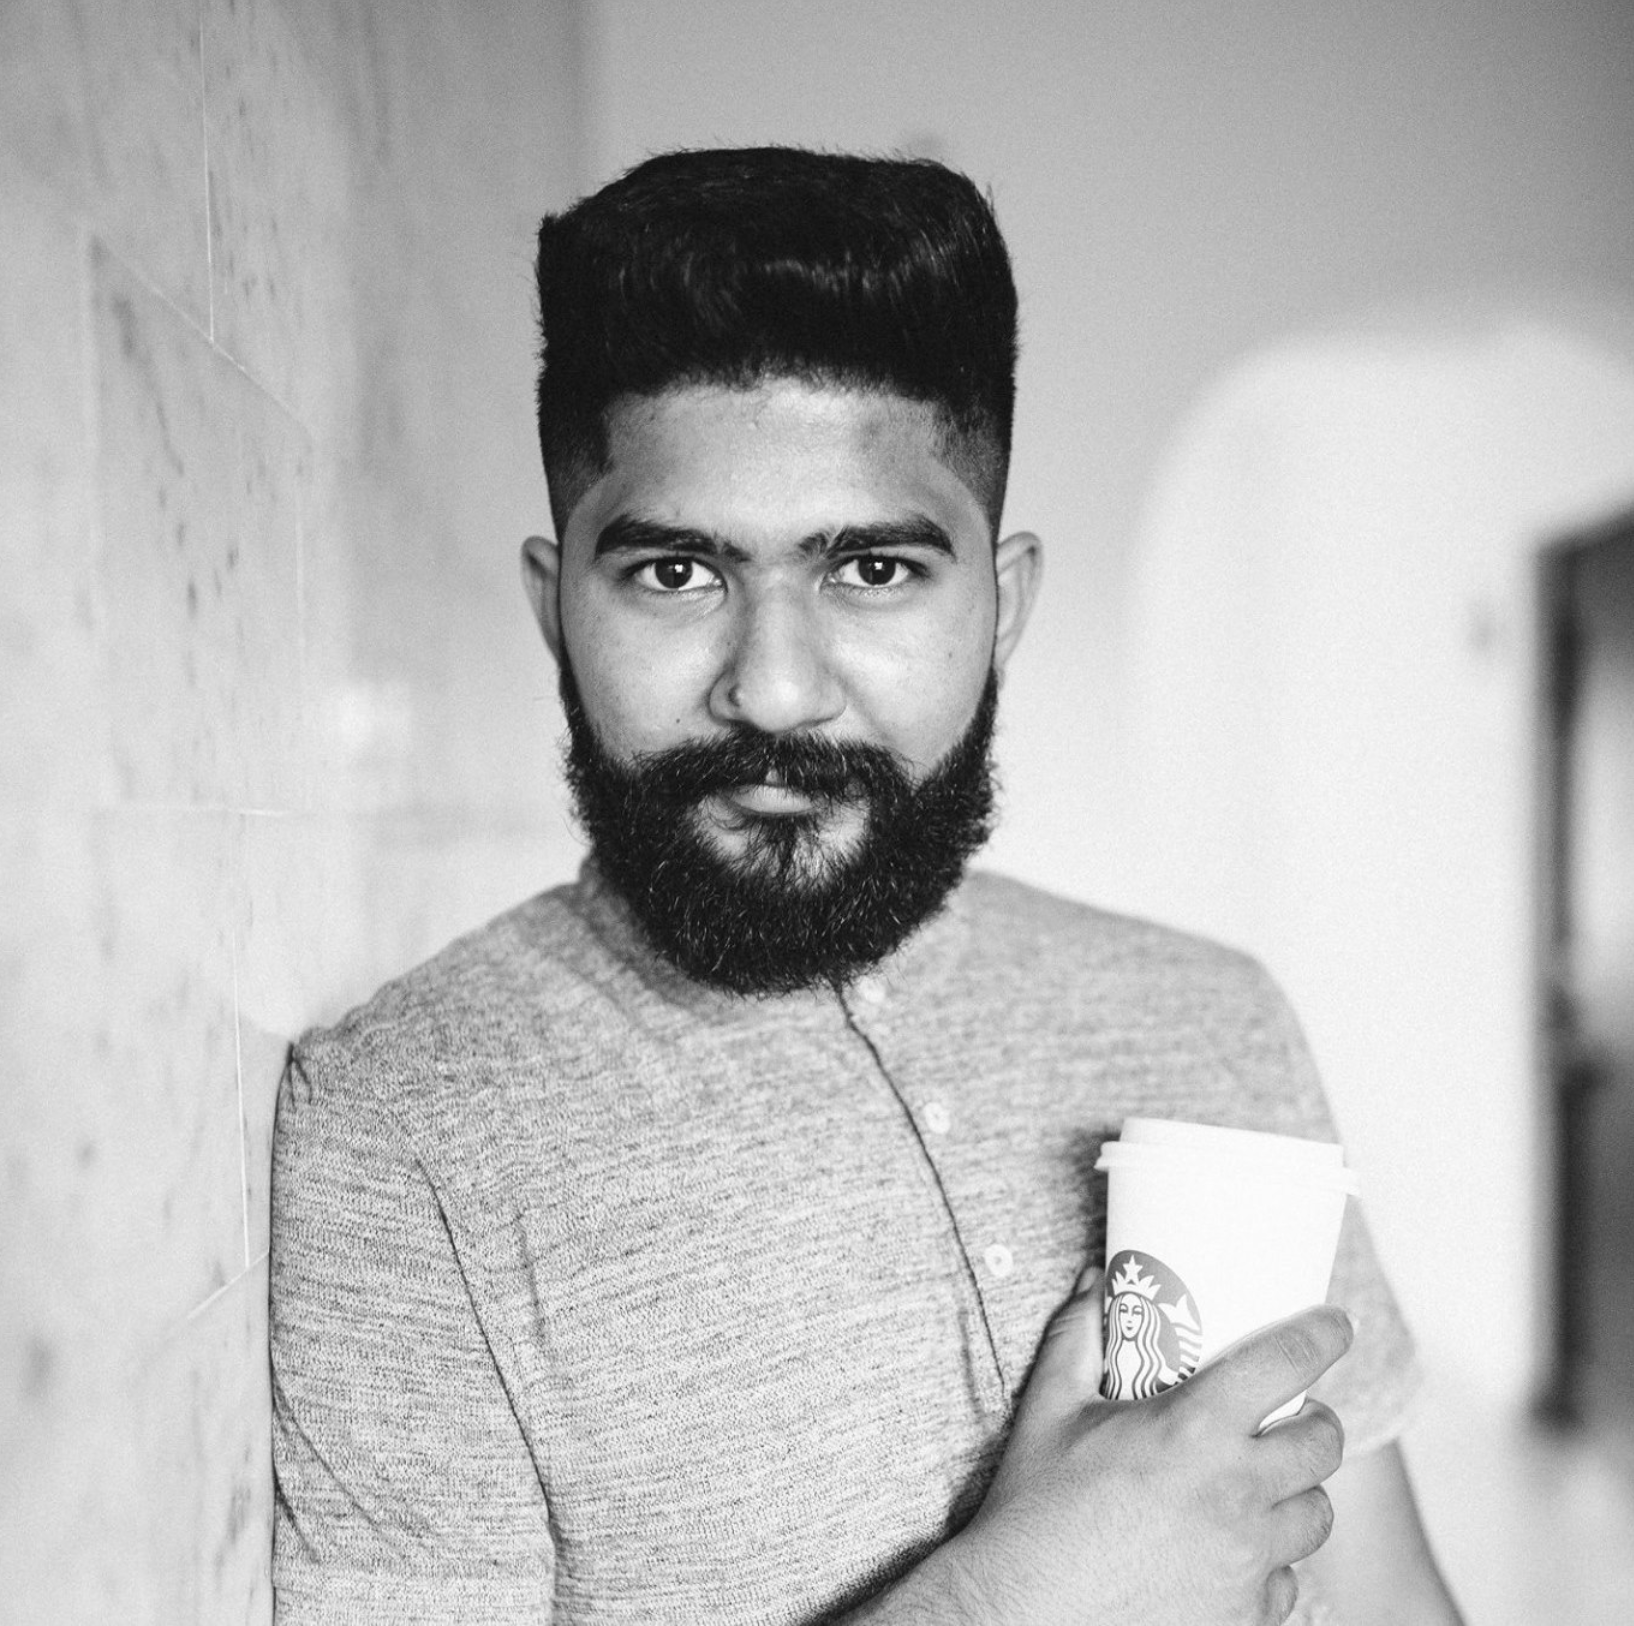 jonathan_lopez